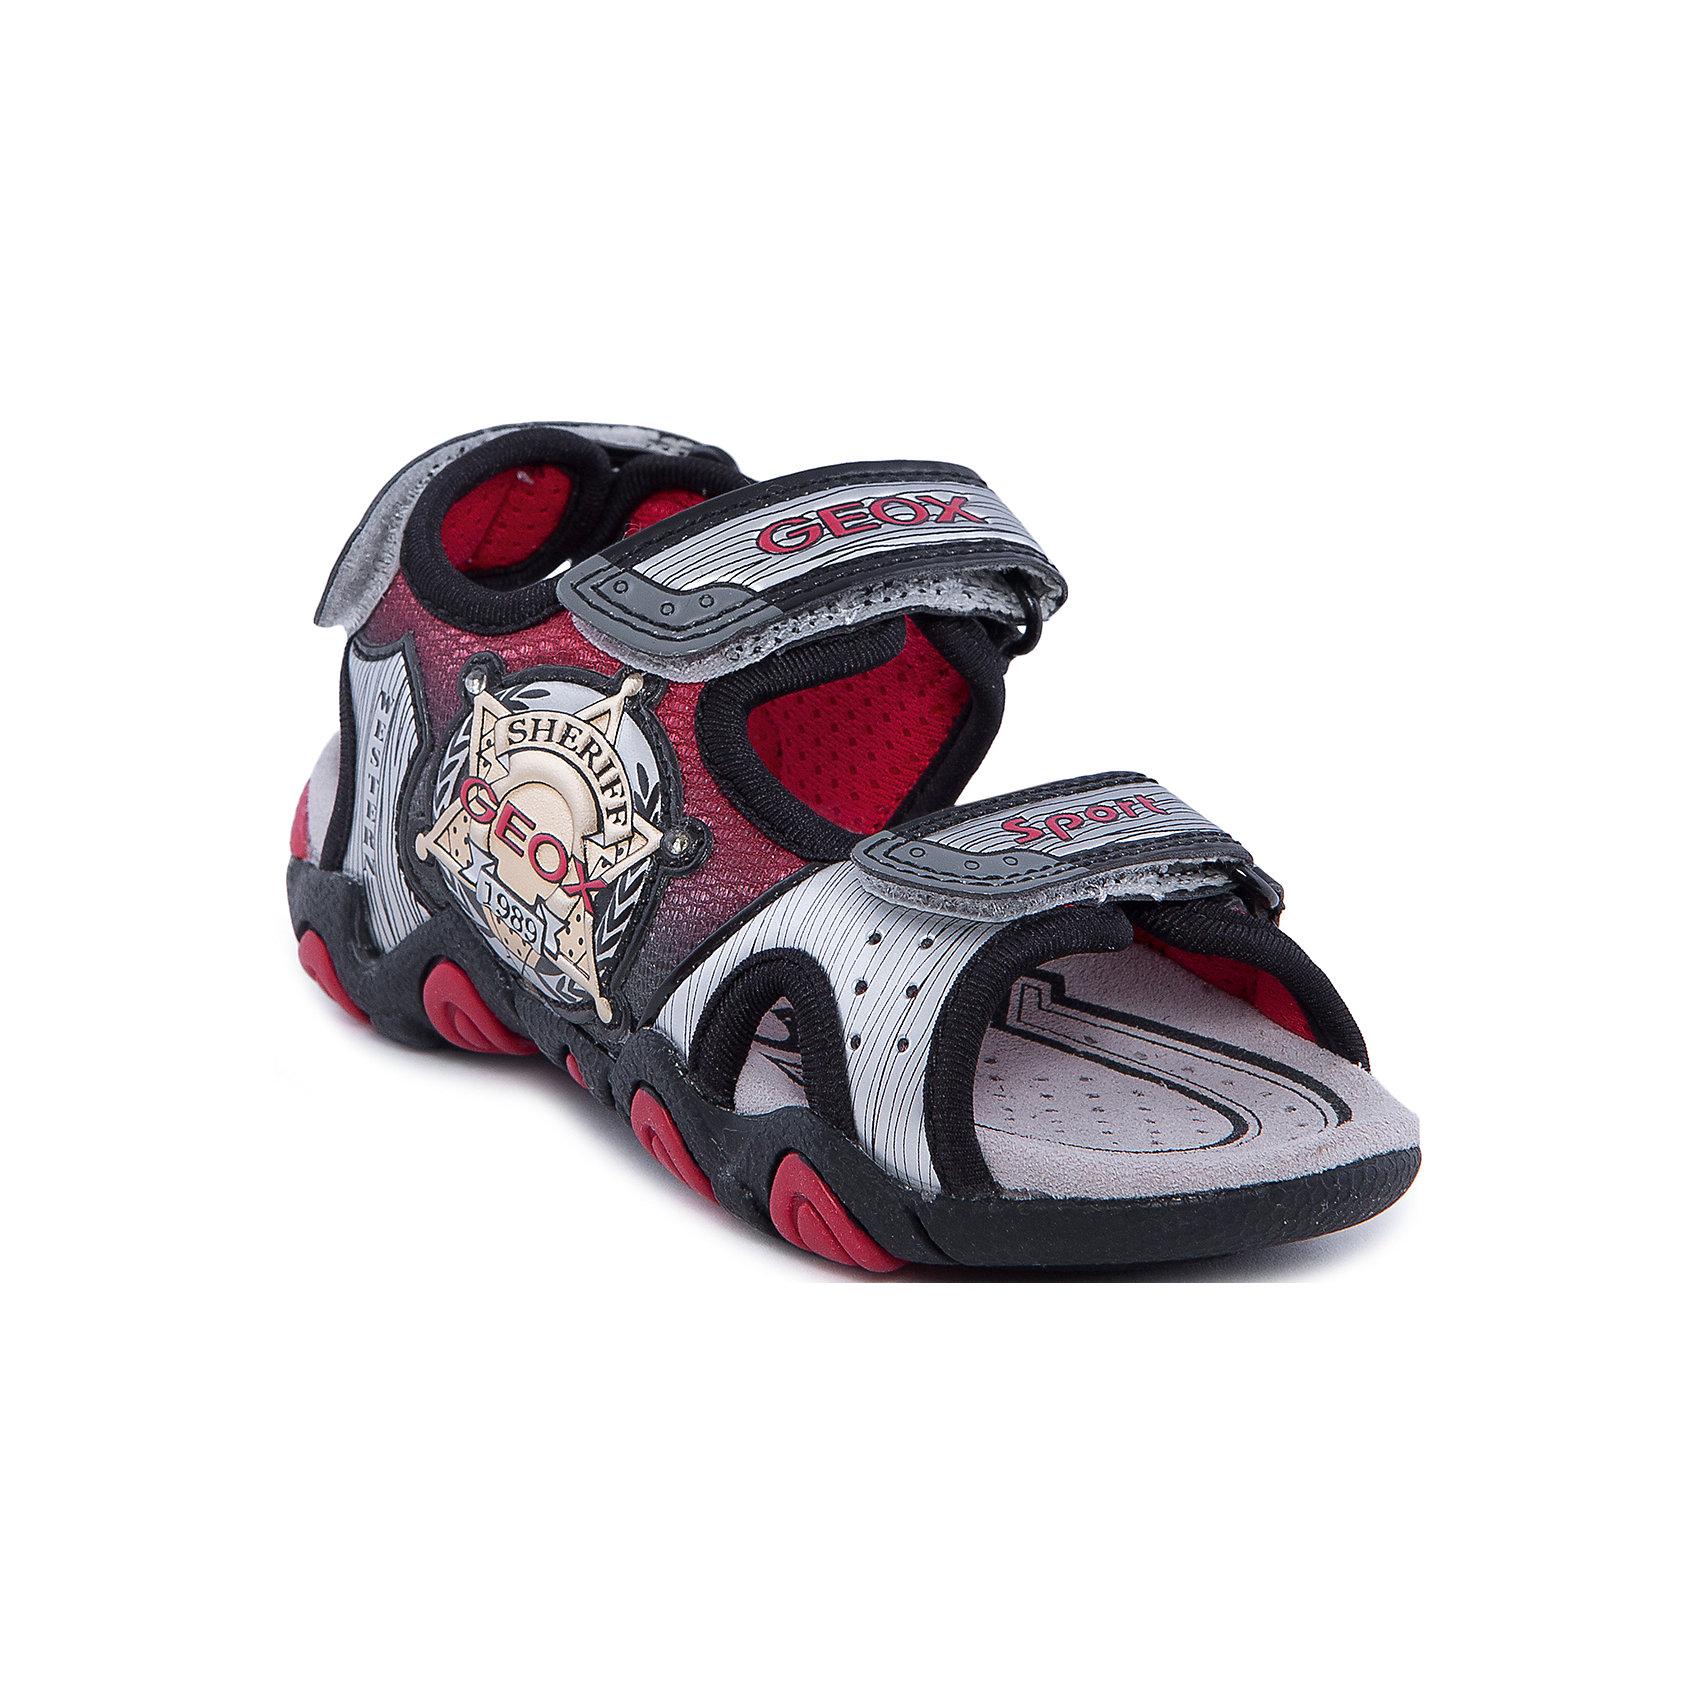 GEOX Сандалии для мальчика GEOX geox ботинки для мальчика geox